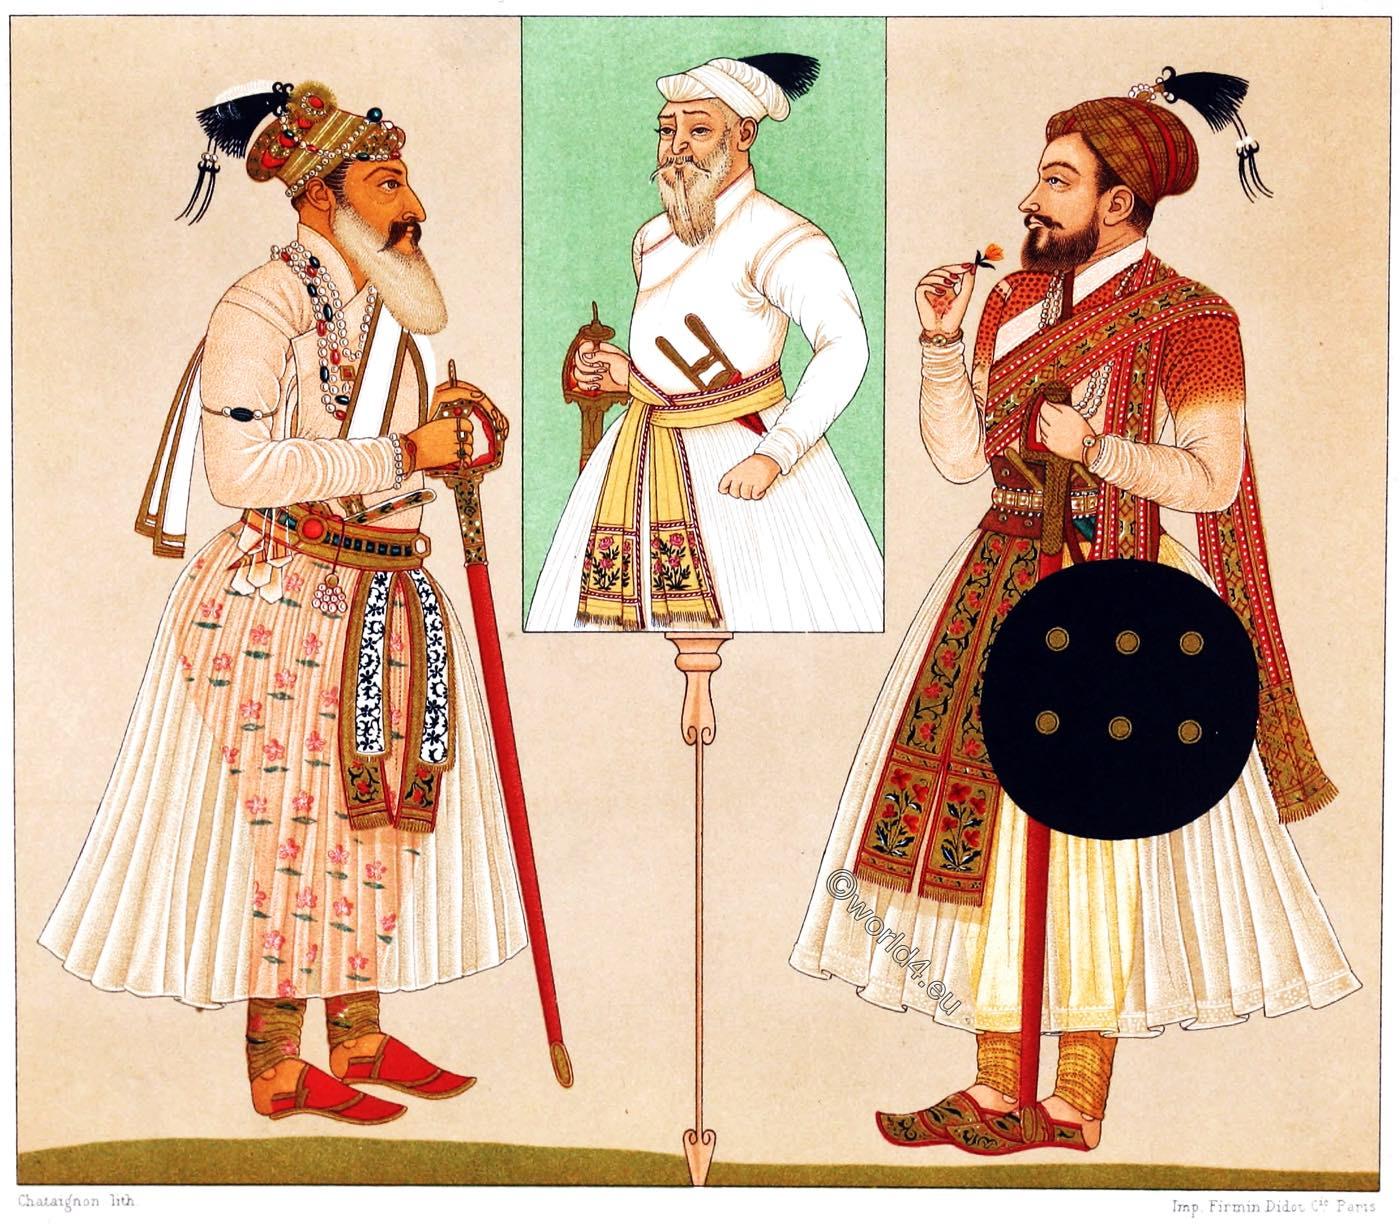 India The Rajputs Portraits Of The Last Rulers Of The Kingdom Of Telingana